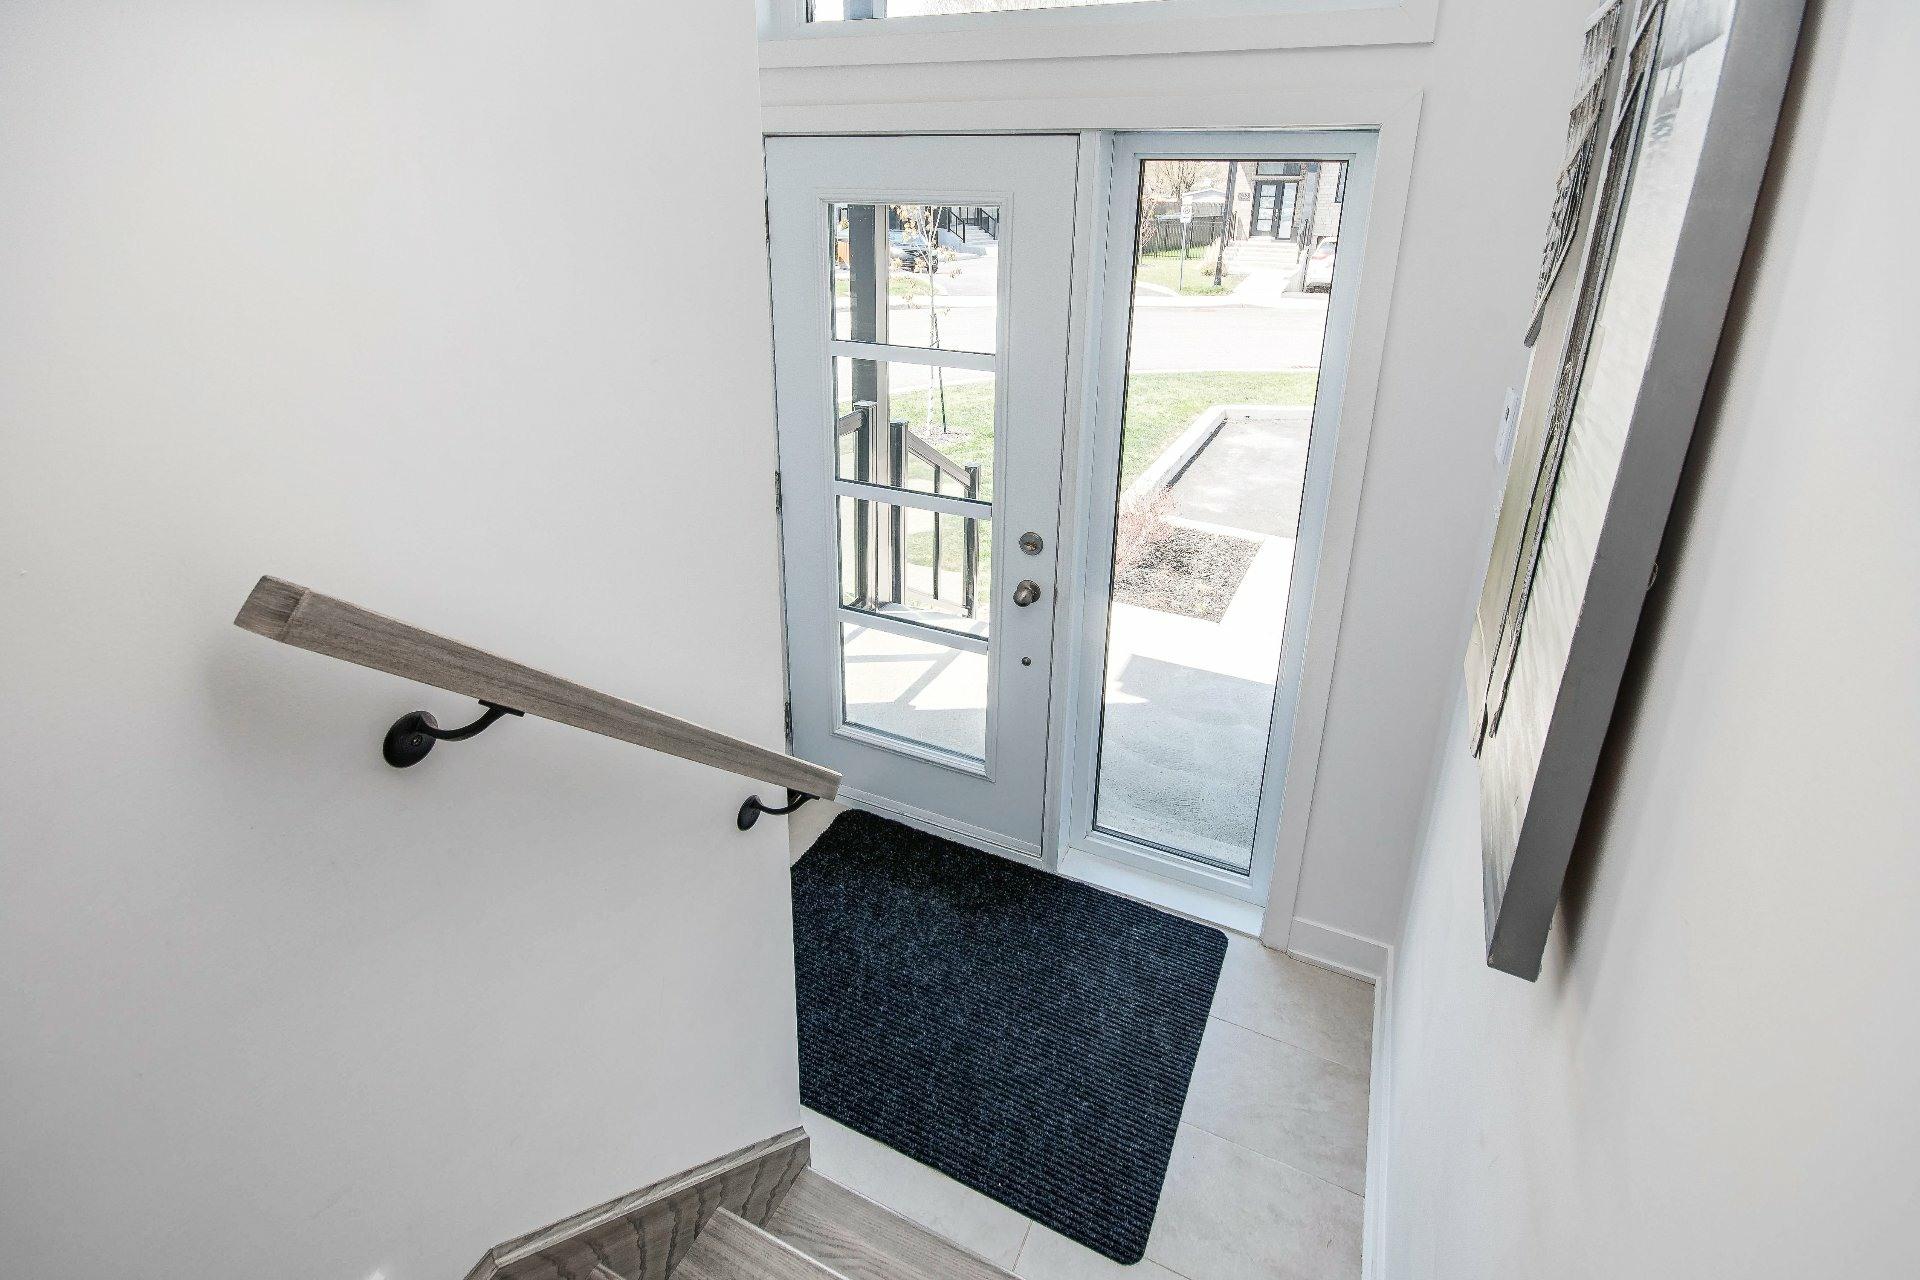 image 11 - MX - Casa sola - MX En venta Saint-Constant - 10 habitaciones